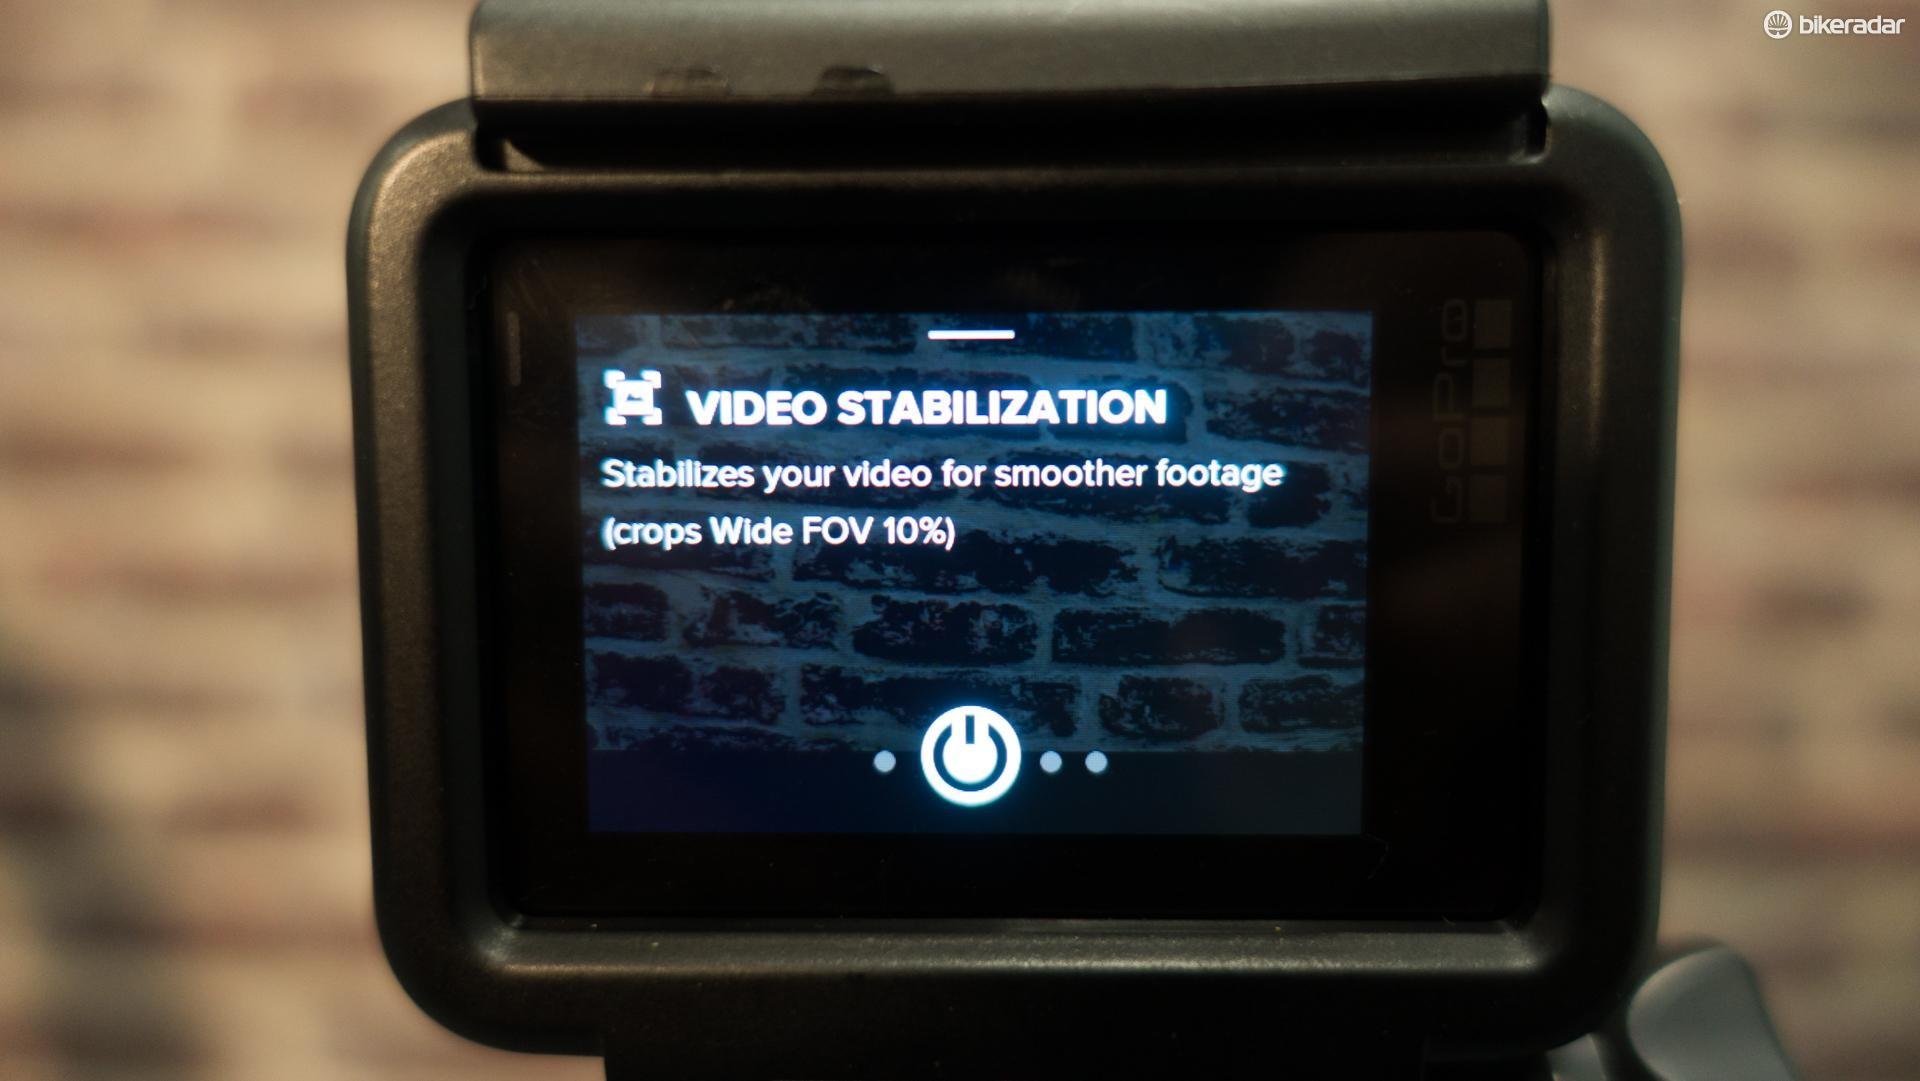 It's got top-notch electronic image stabilisation